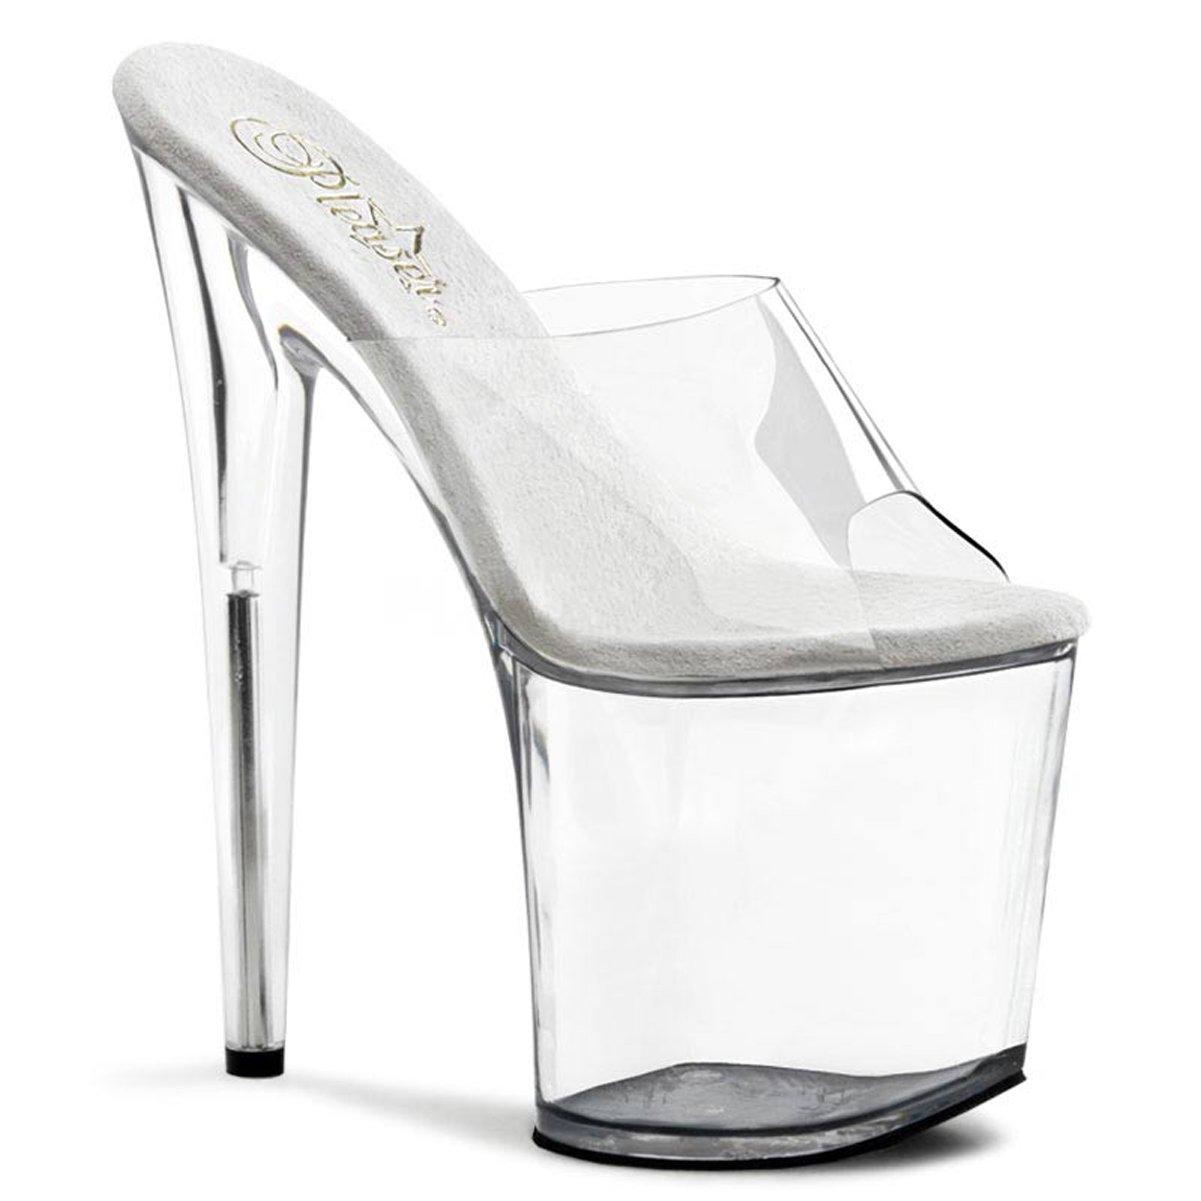 8 Inch Heel High Platform Sandal Shoe Slip On Sexy Stripper Shoes Open Toe B002XF04M4 8 B(M) US|Clear